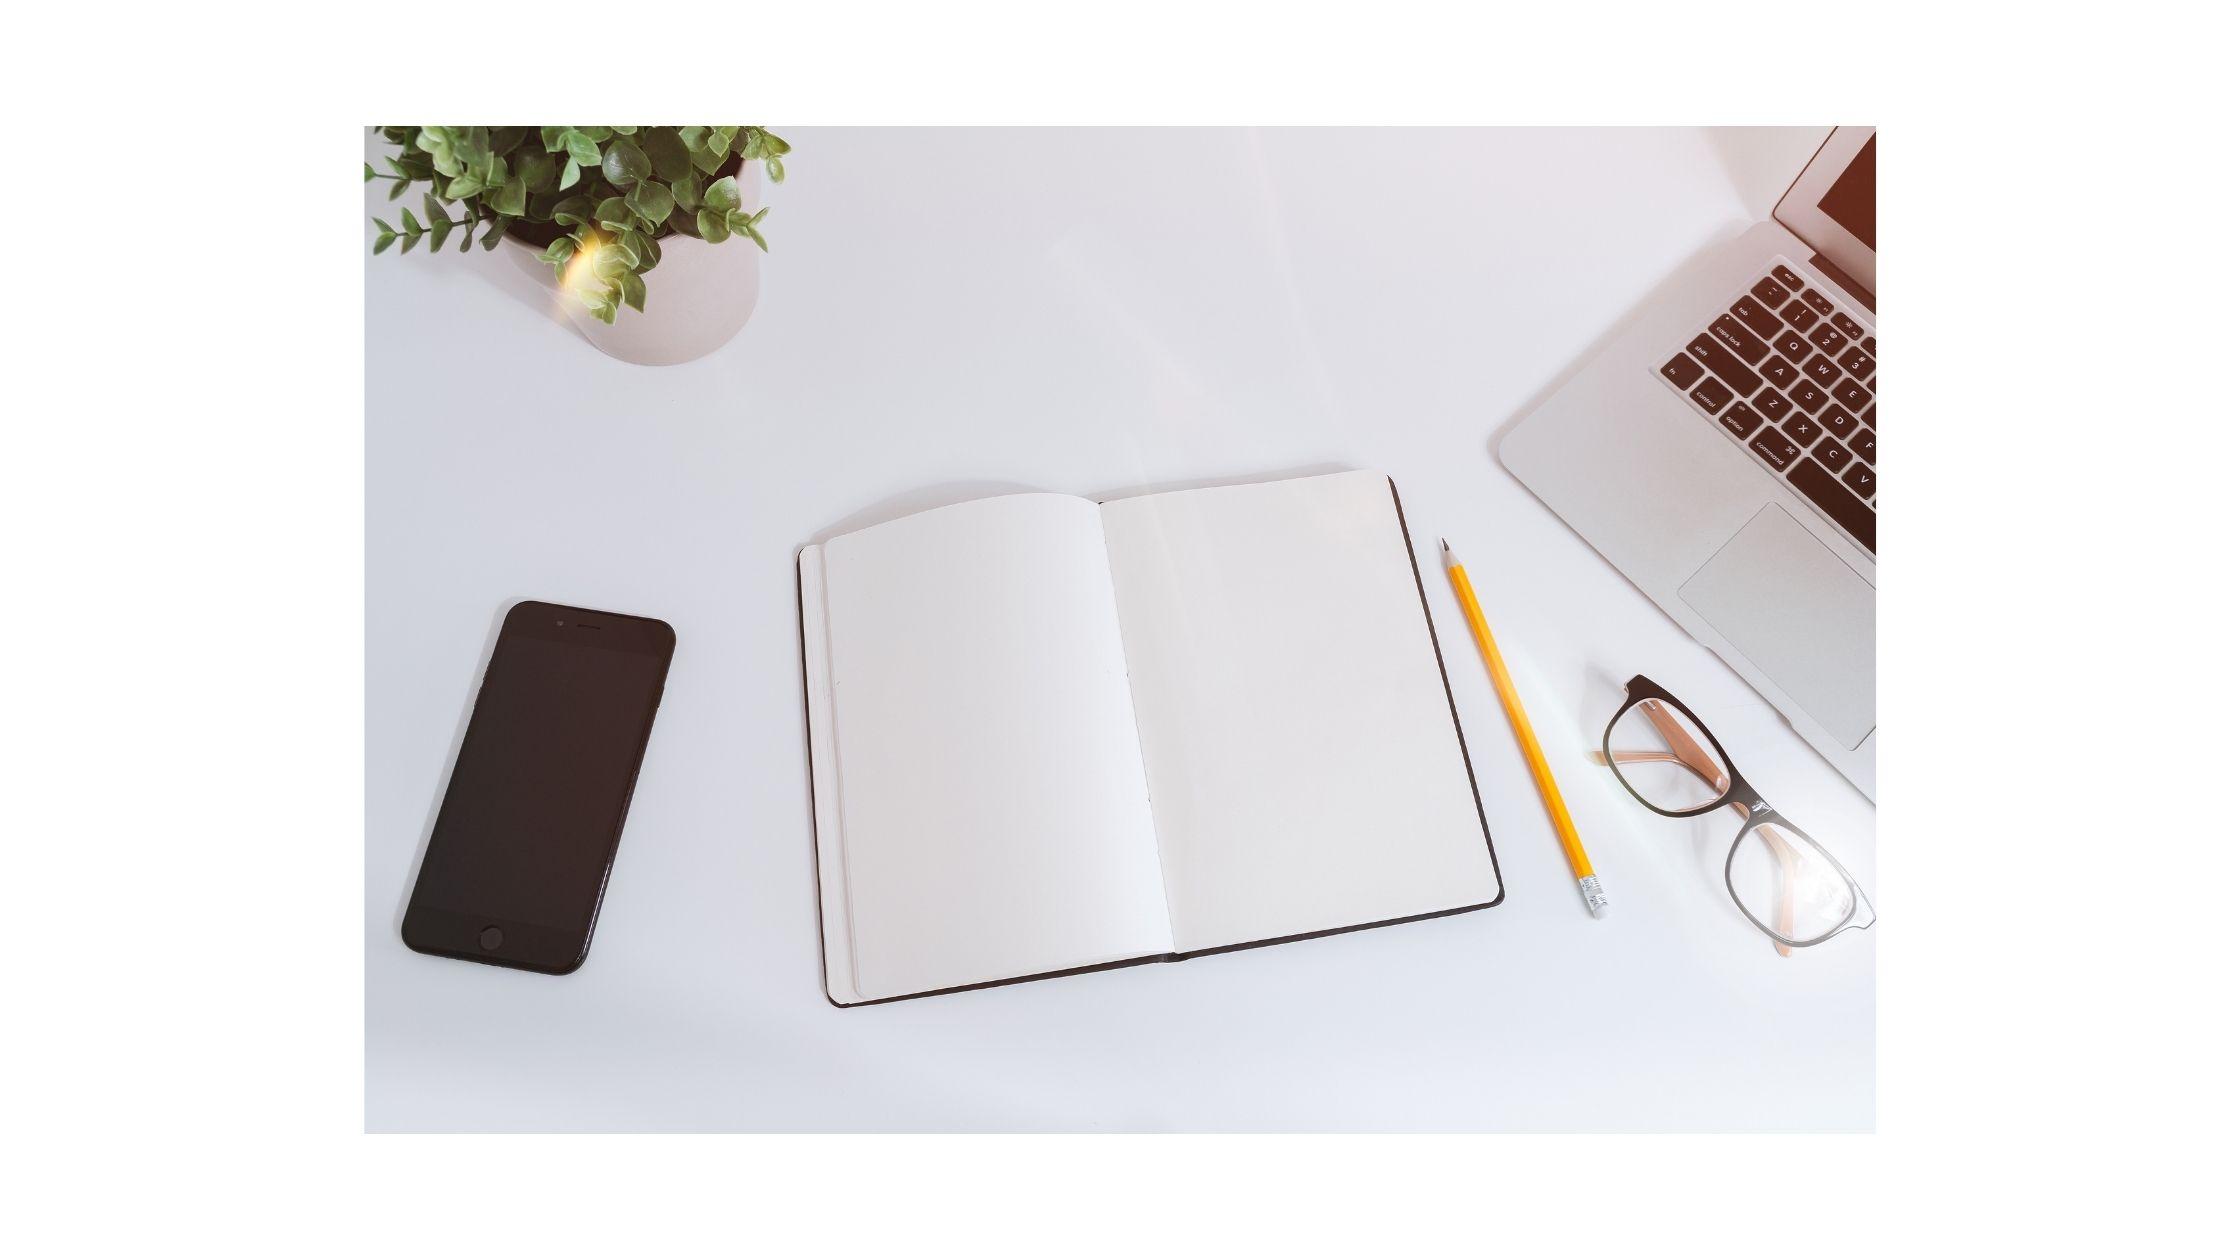 An open book next to a computer